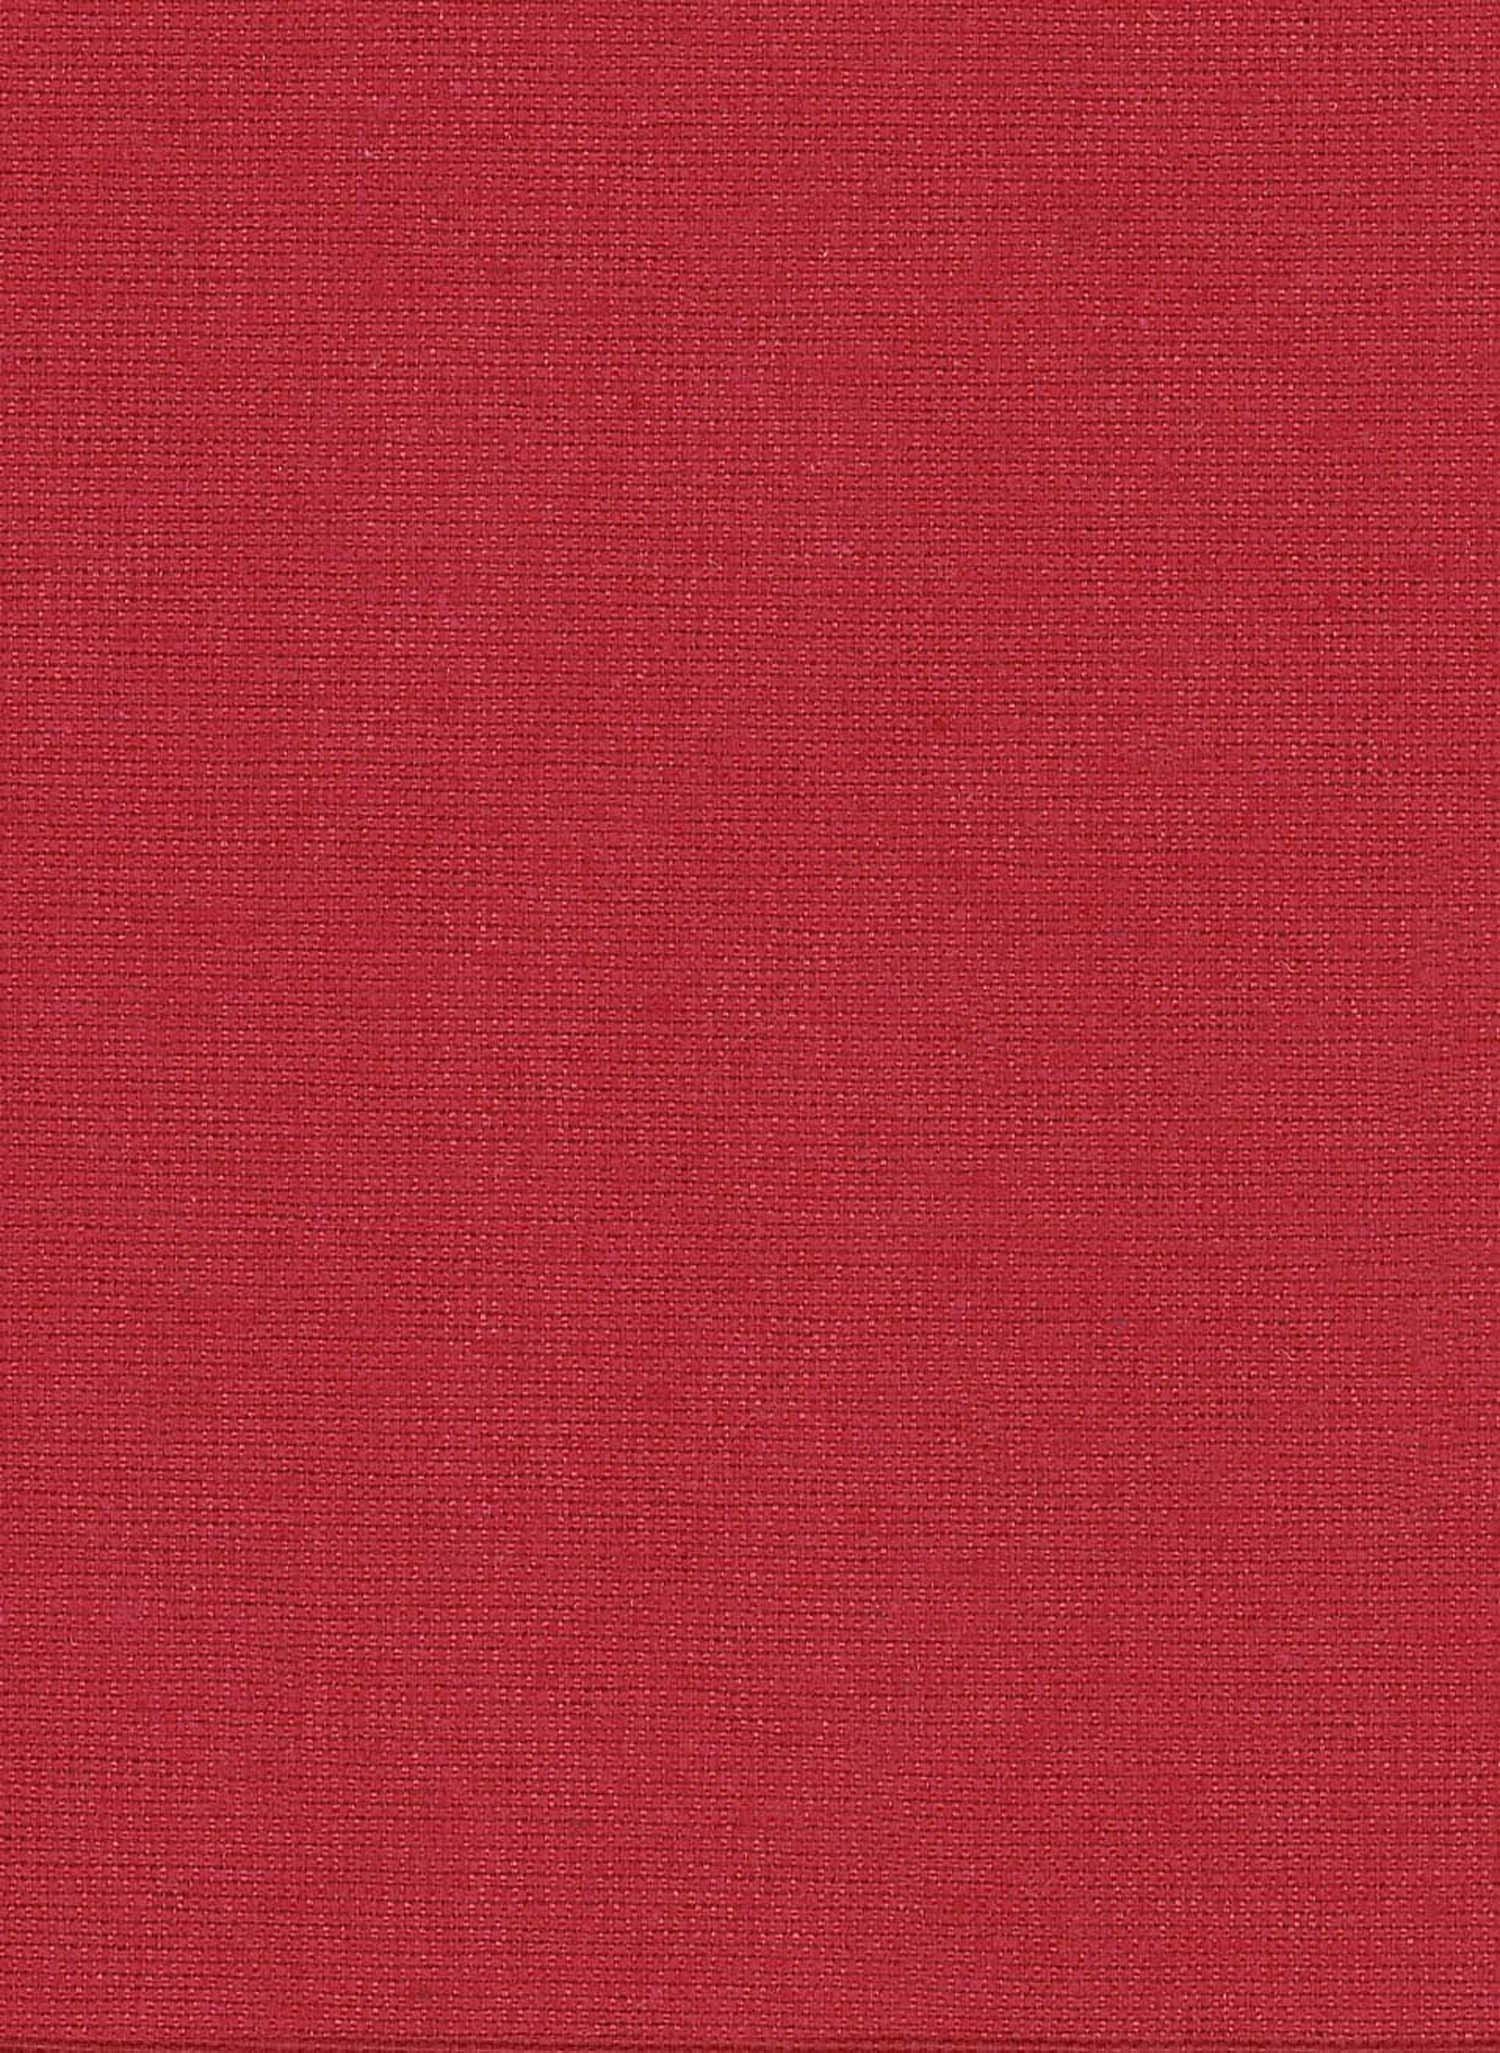 Stuhl-Überzug,2er Set bordeaux - 1 - Ronja.ch